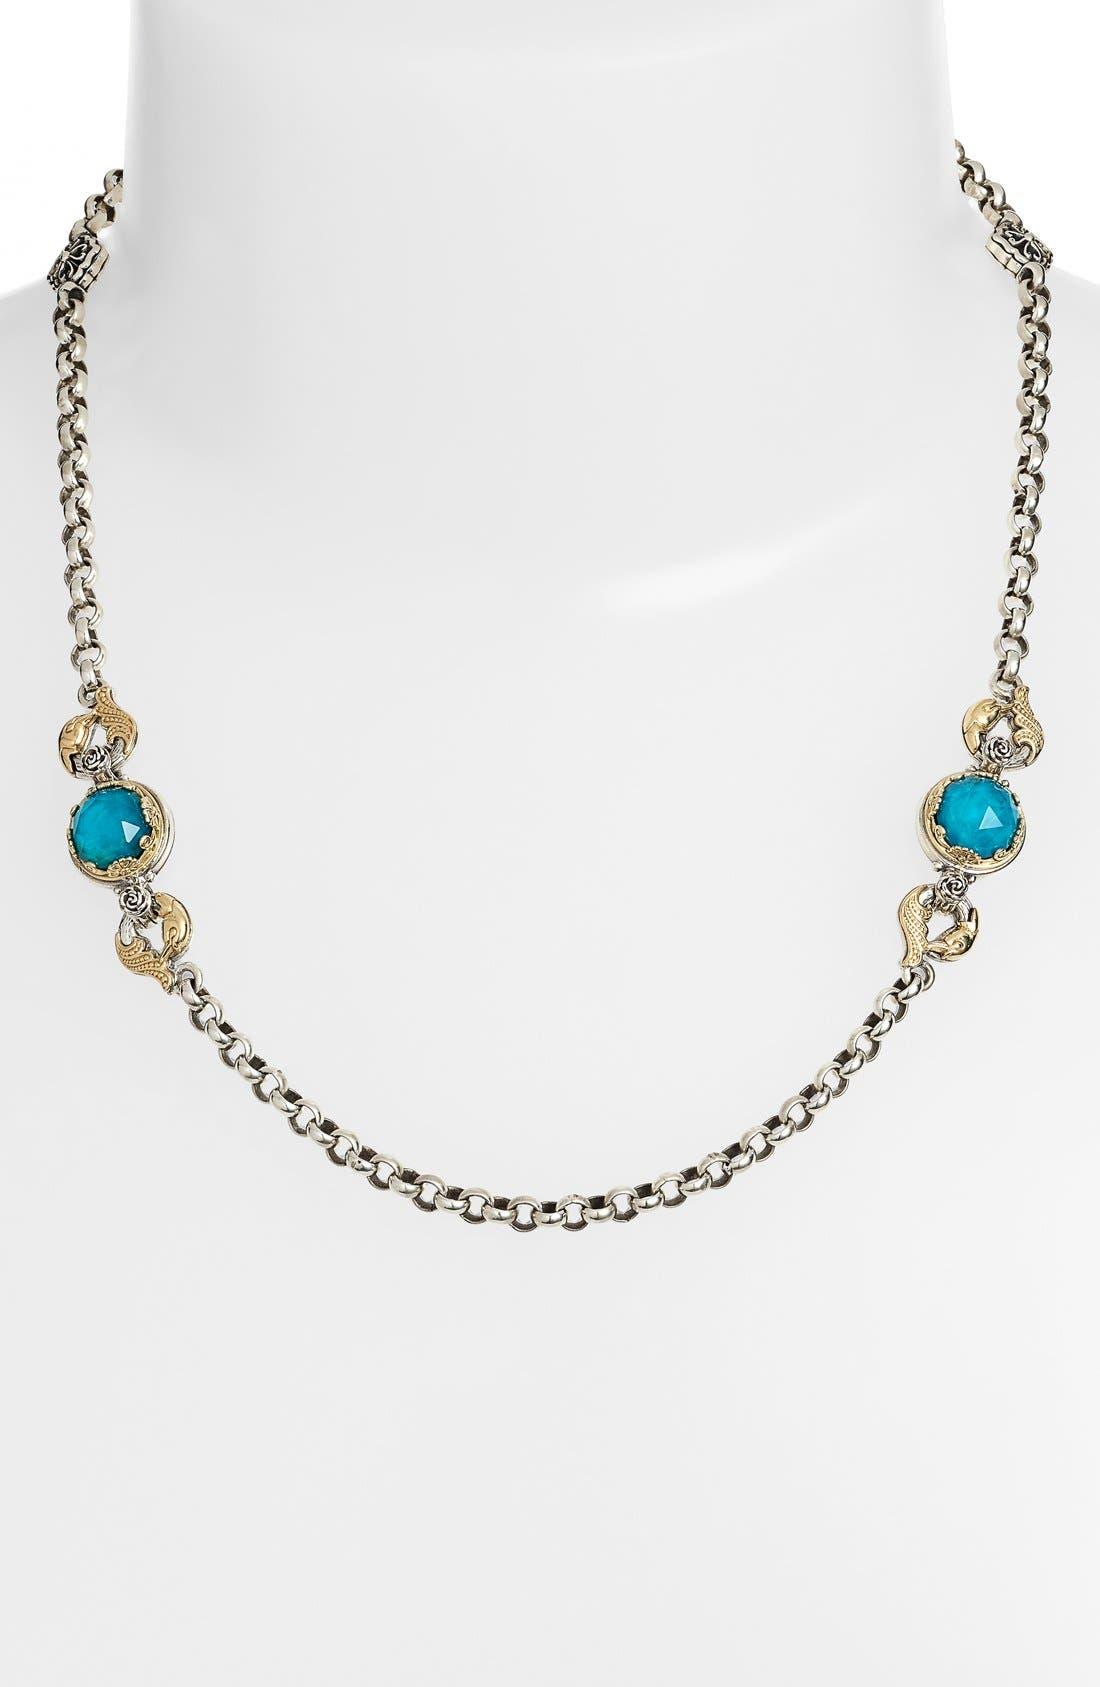 KONSTANTINO 'Iliada' Semiprecious Stone Necklace